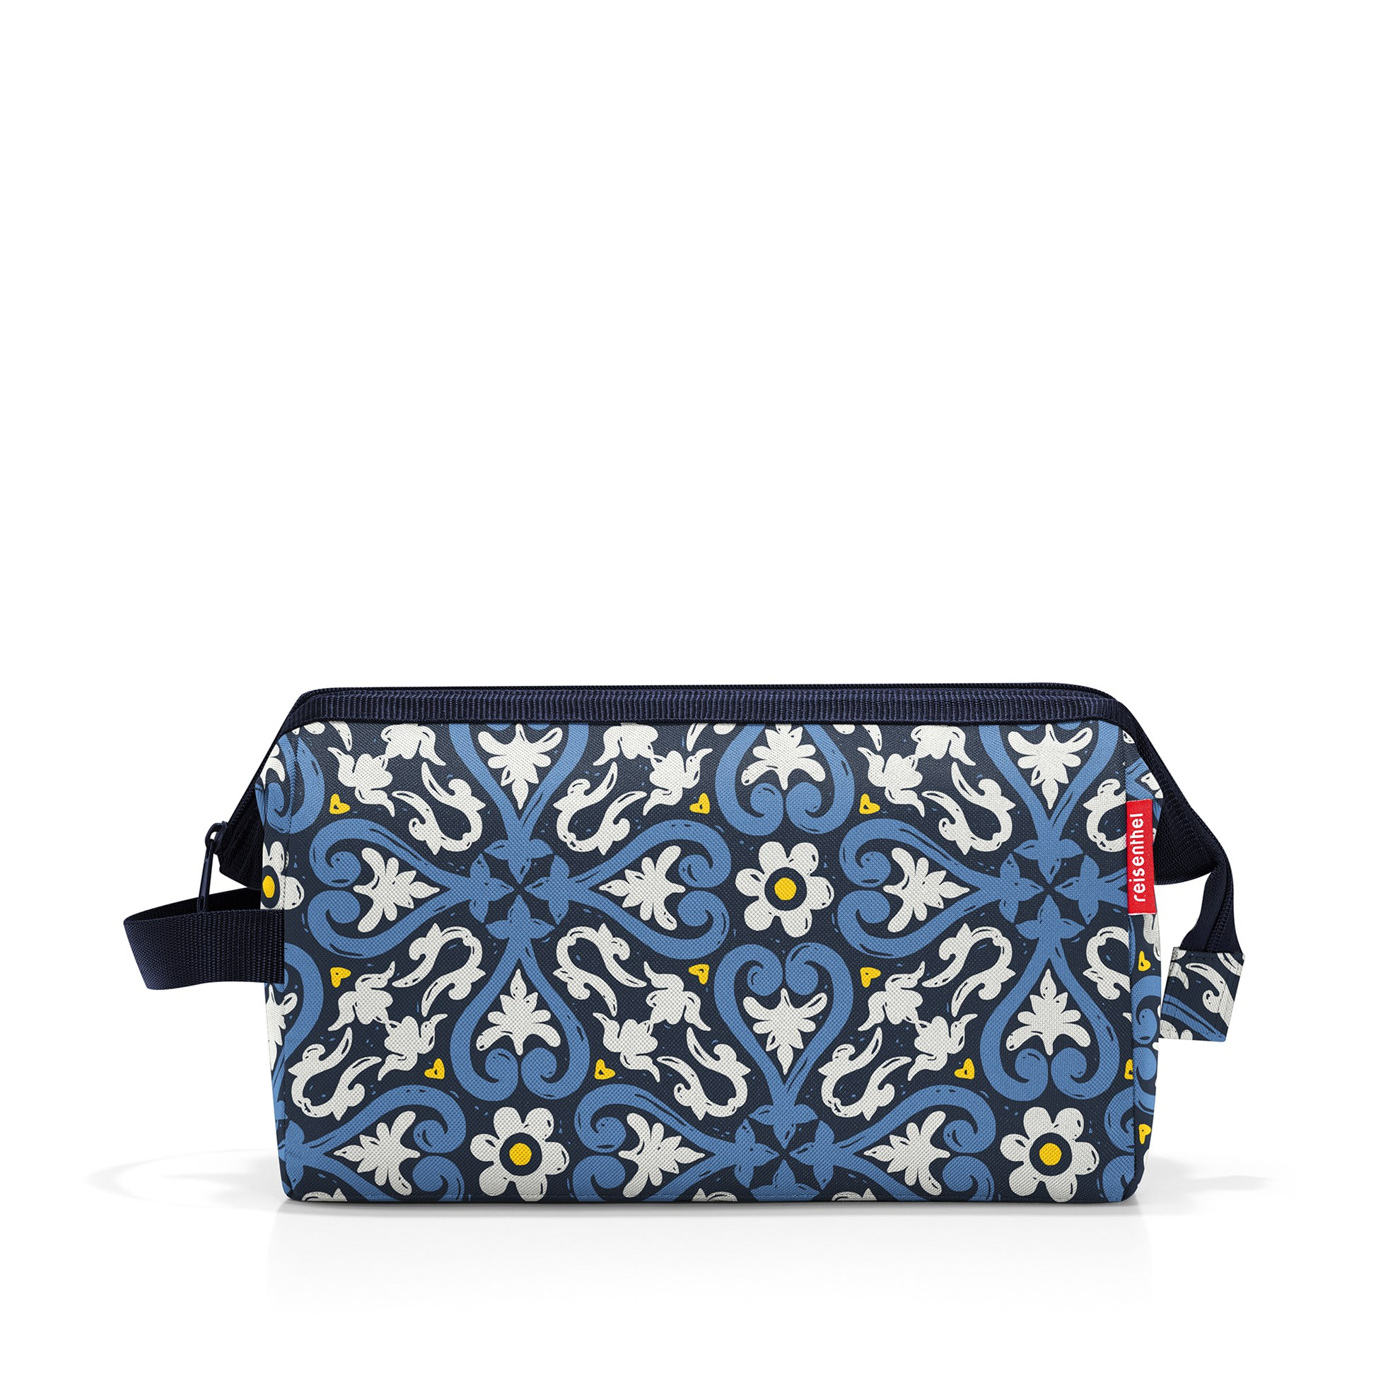 Kosmetická taška Travelcosmetic XL floral 1_2